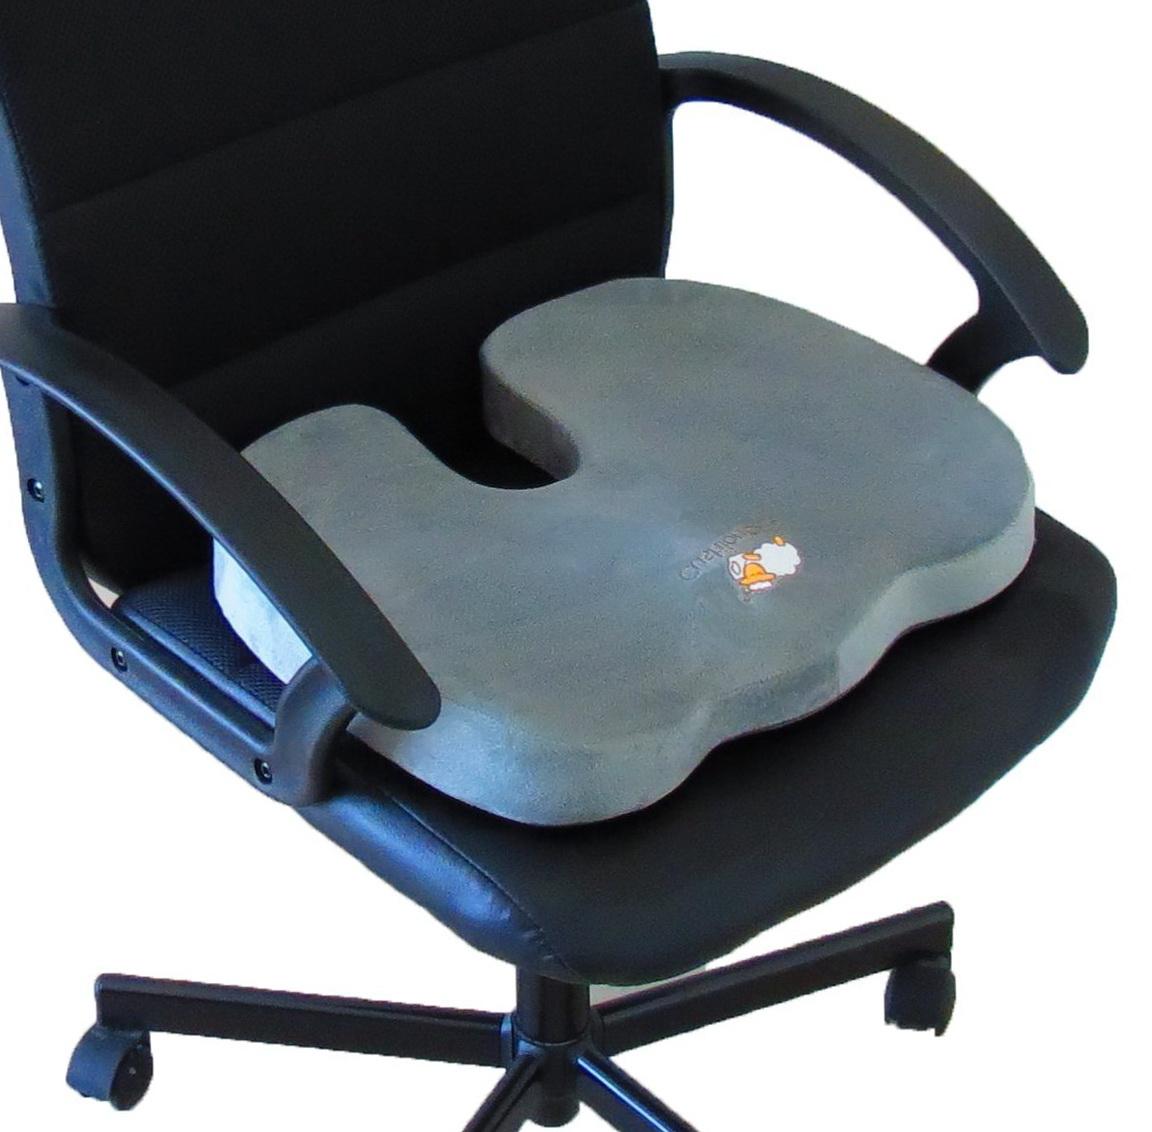 Car Seat Cushions Amazon